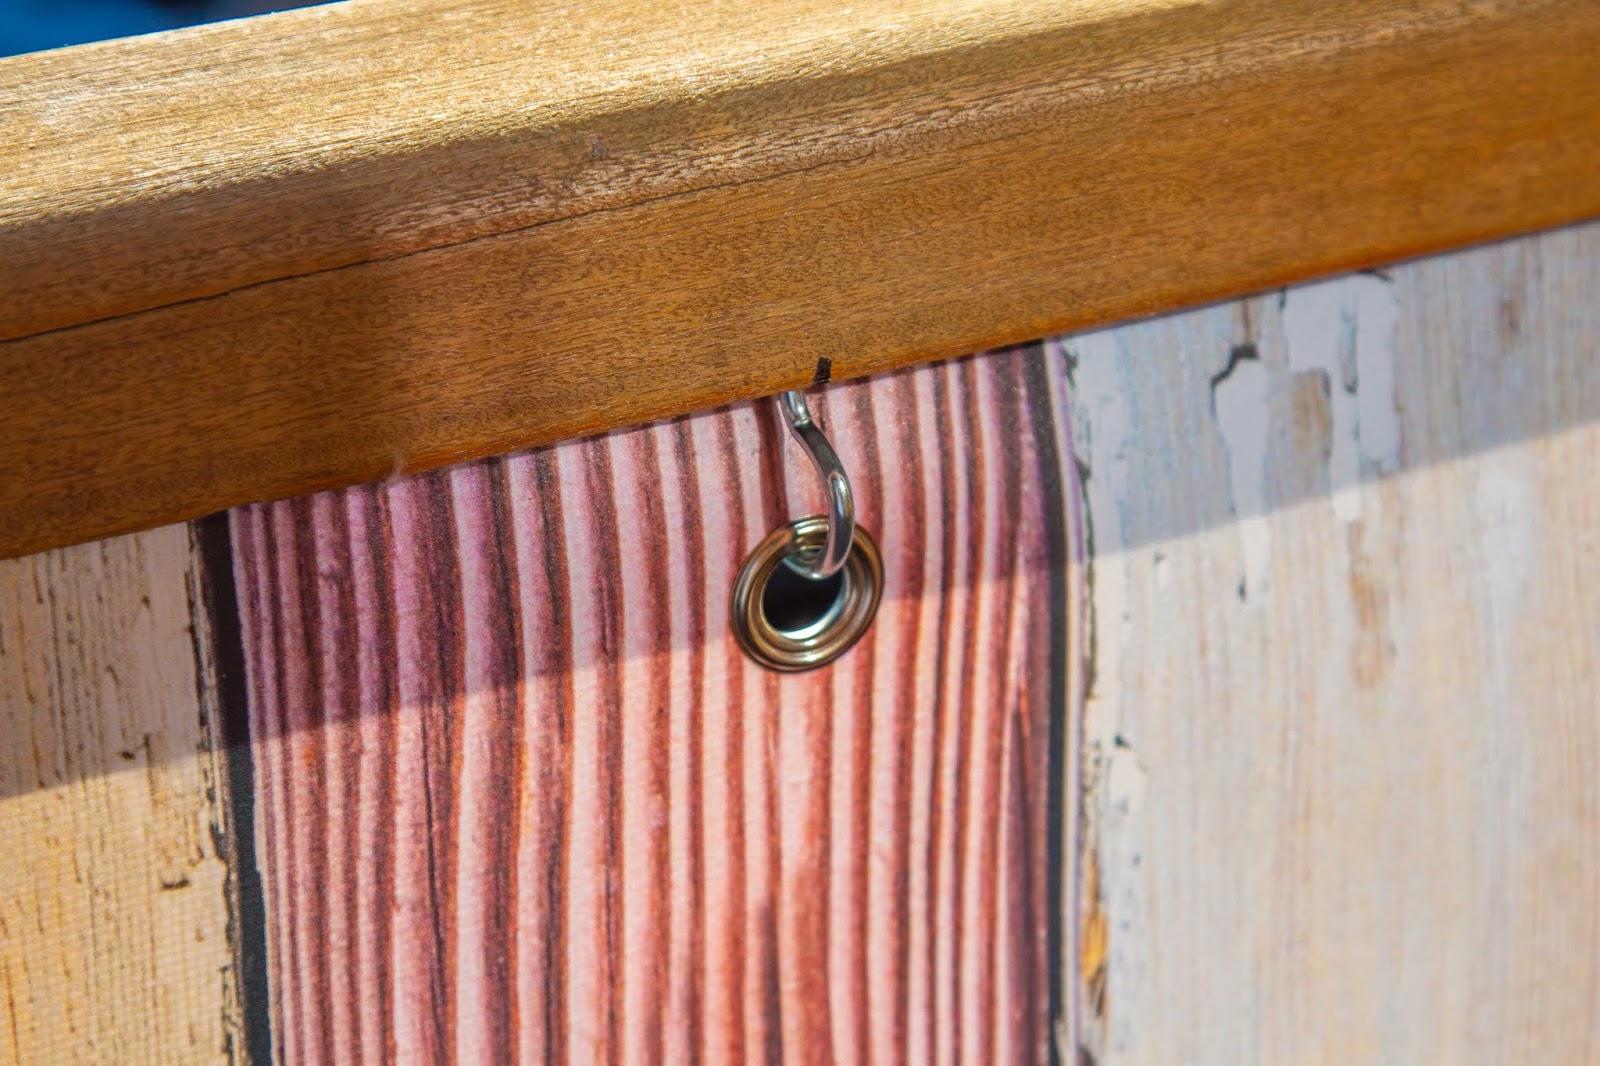 Embellir son balcon grâce au site de décoration Scenolia